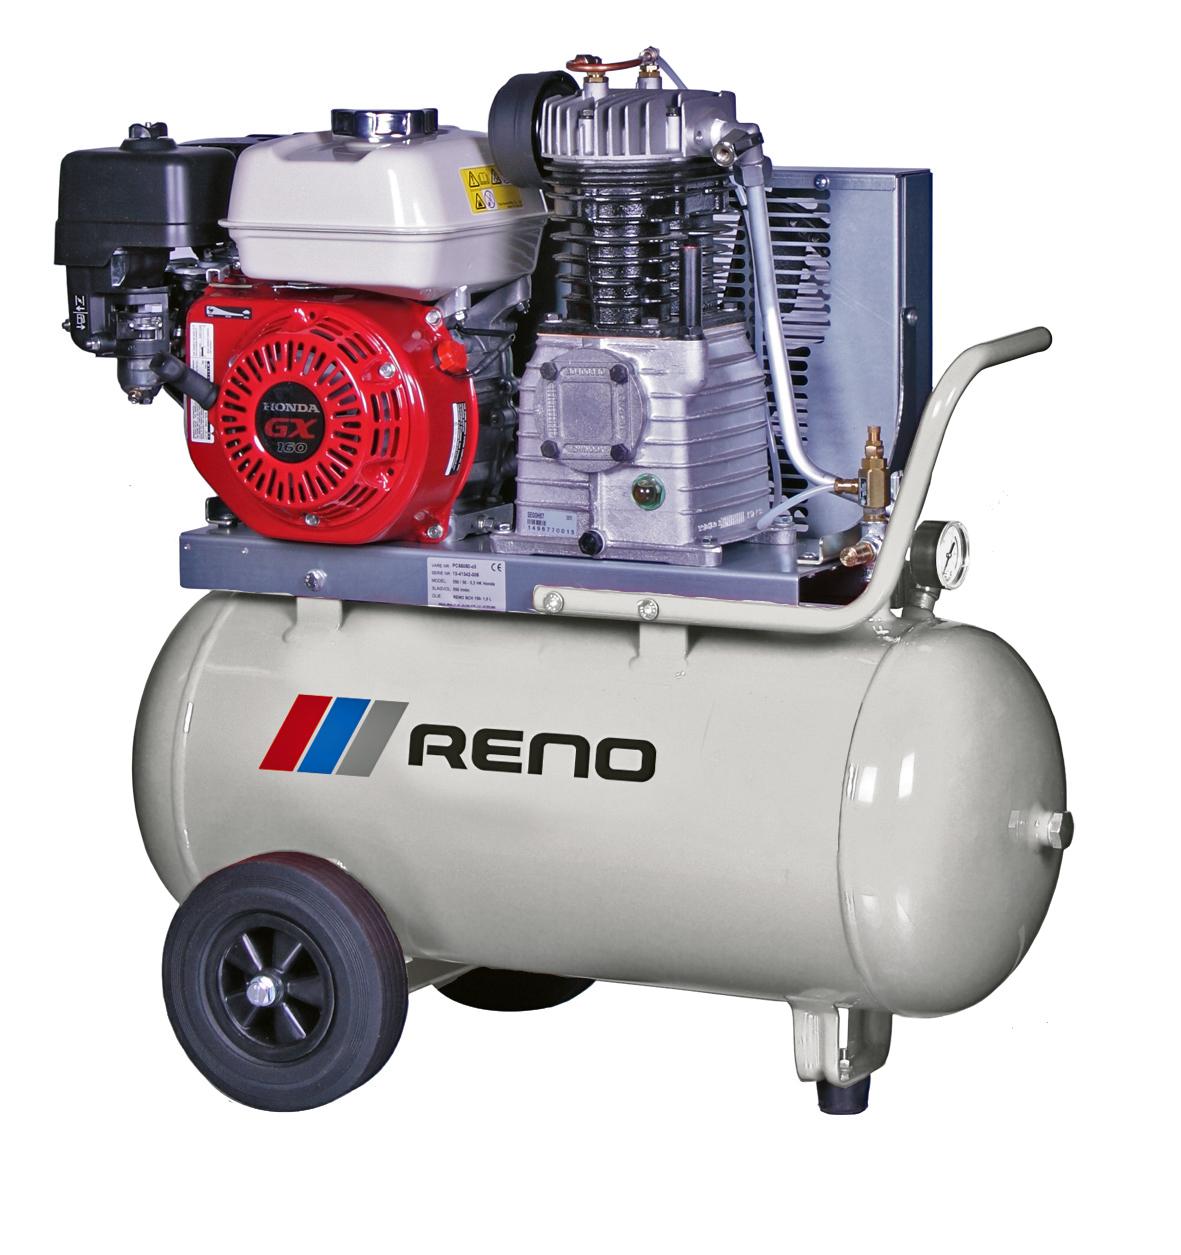 RENO 550/50 Honda 4 Stroke M Start Image